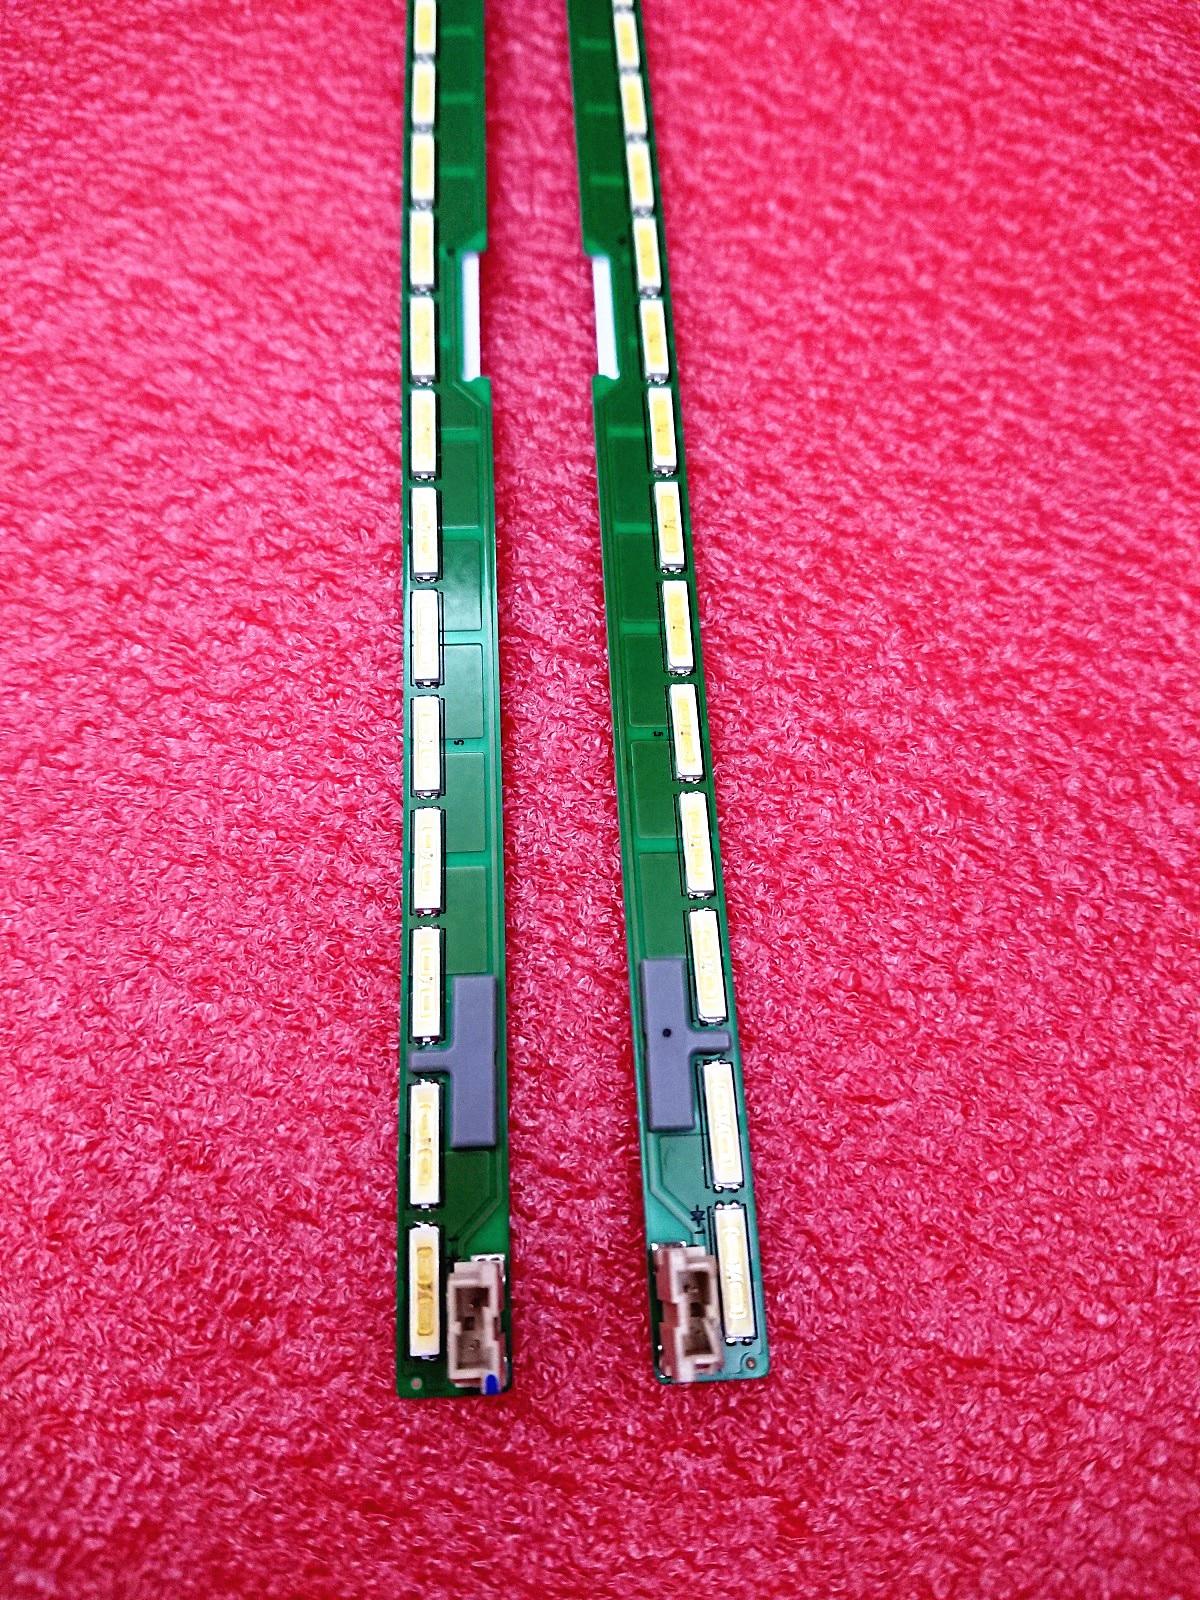 2Pieces/lot LED Backlight Strip 6916L-2234A +6916L-2235A (6922L-0149) For LG 55LF6309  100%NEW